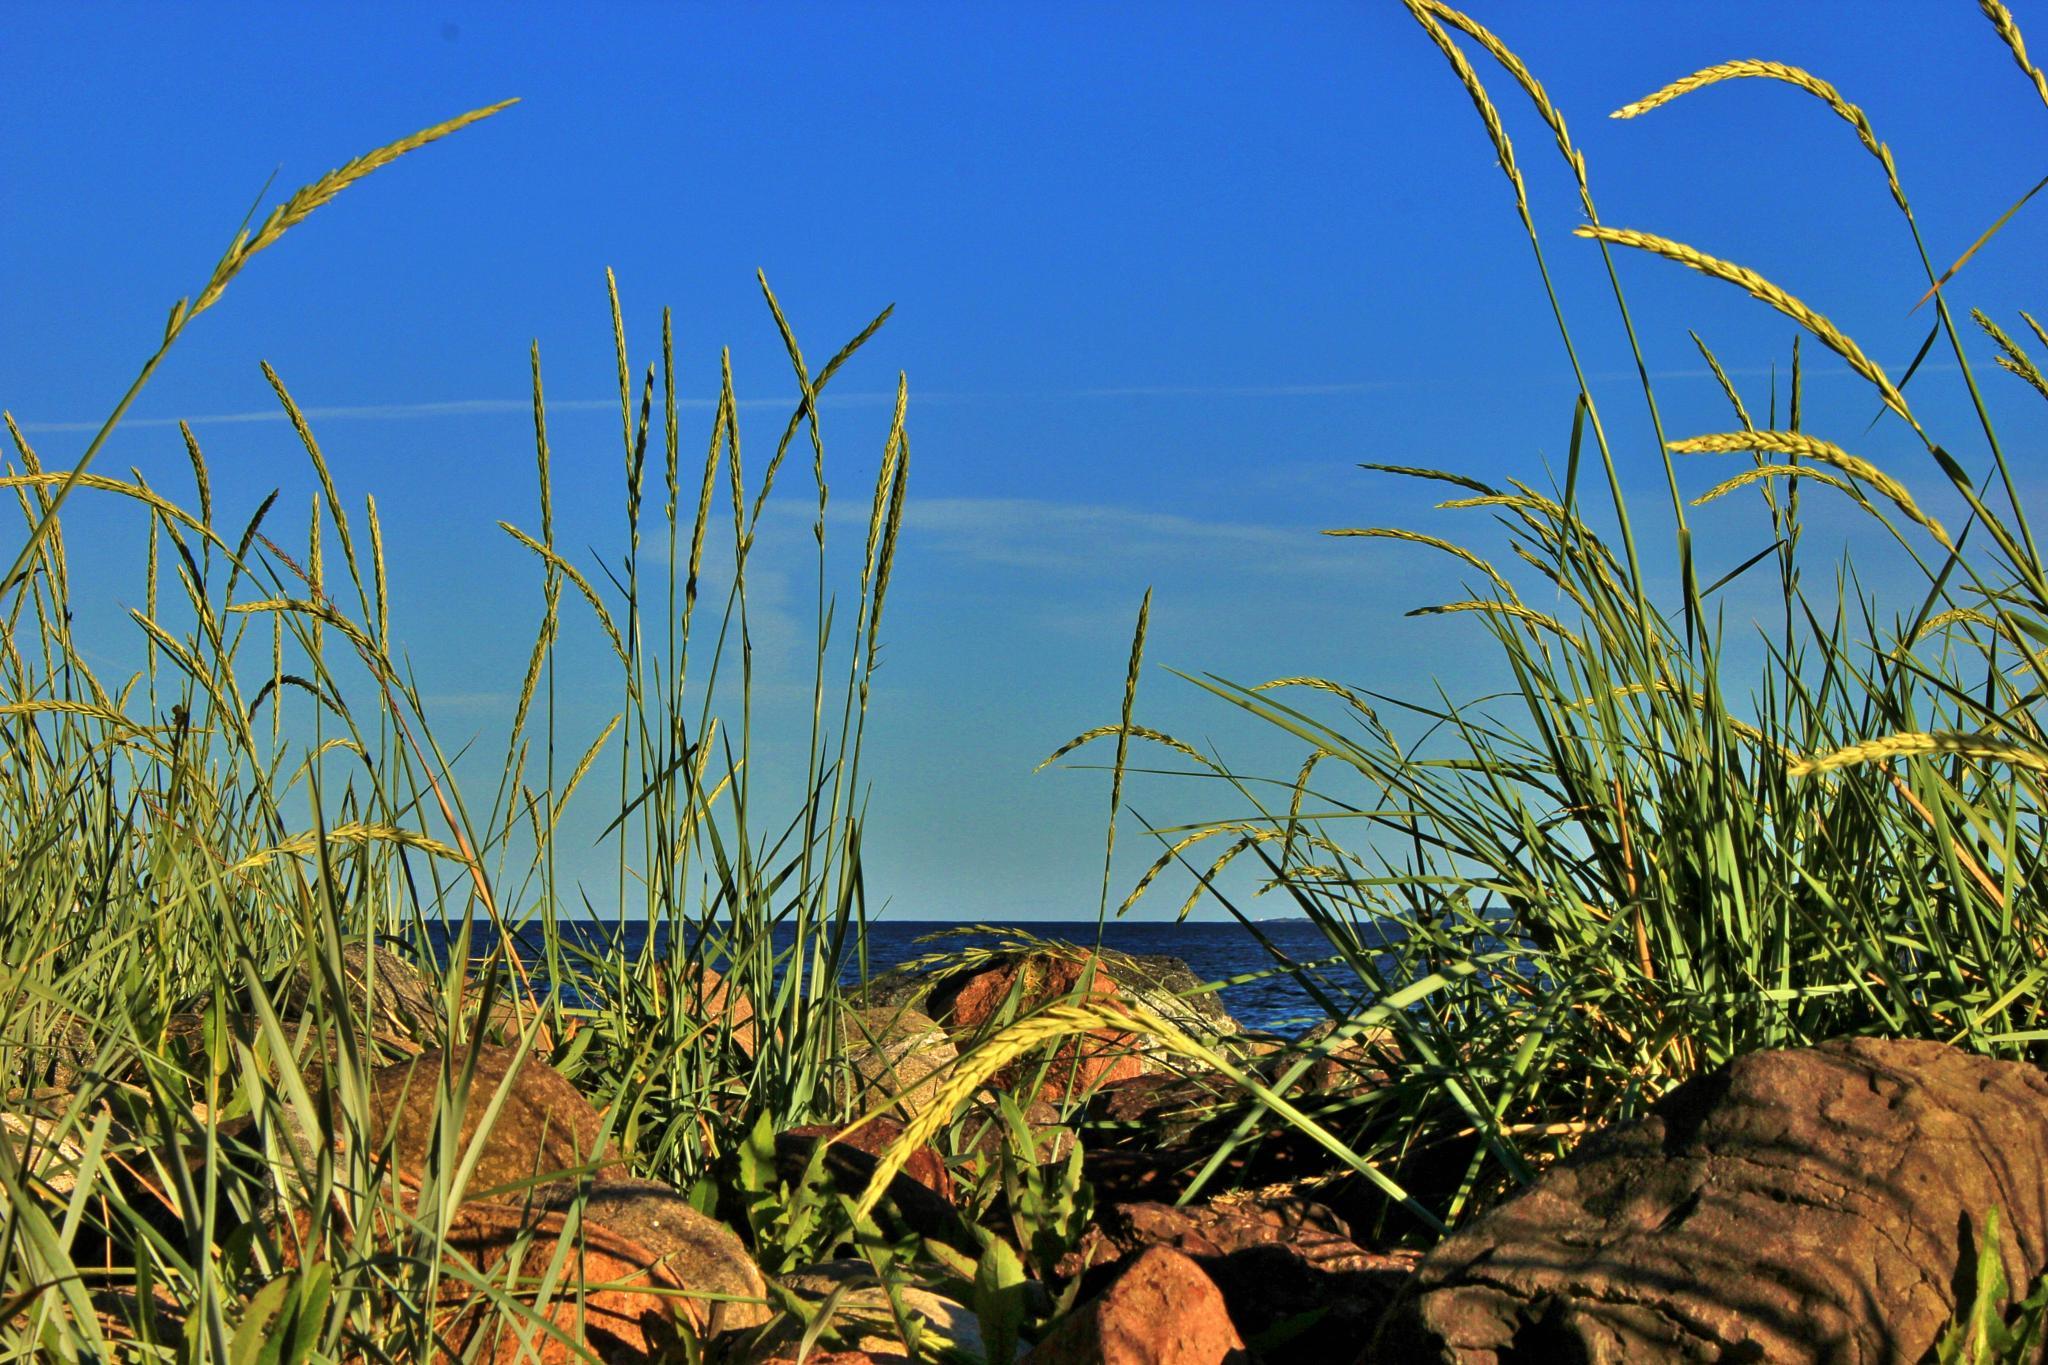 Summerdream by laila.sandbekk